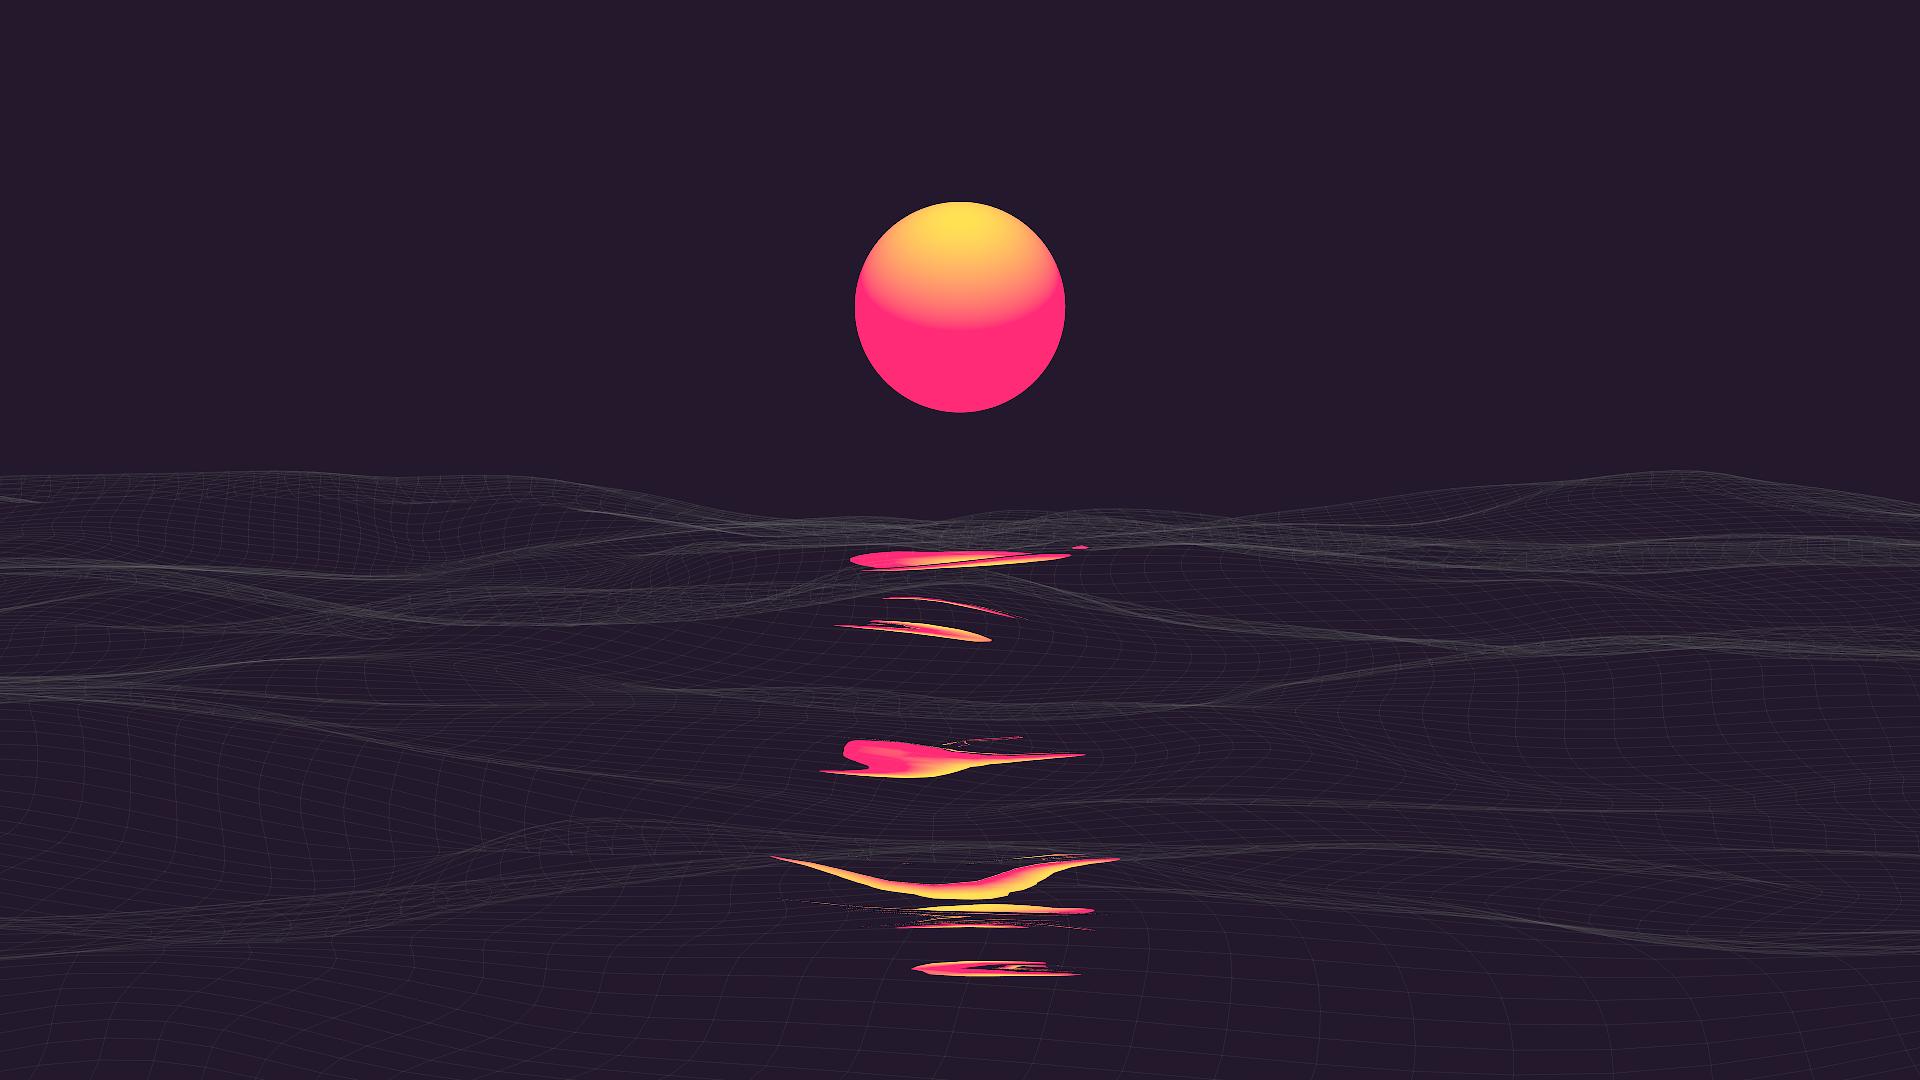 General 1920x1080 landscape abstract vaporwave purple background retrowave Retrowave sunrise sea clear sky sky pink digital art